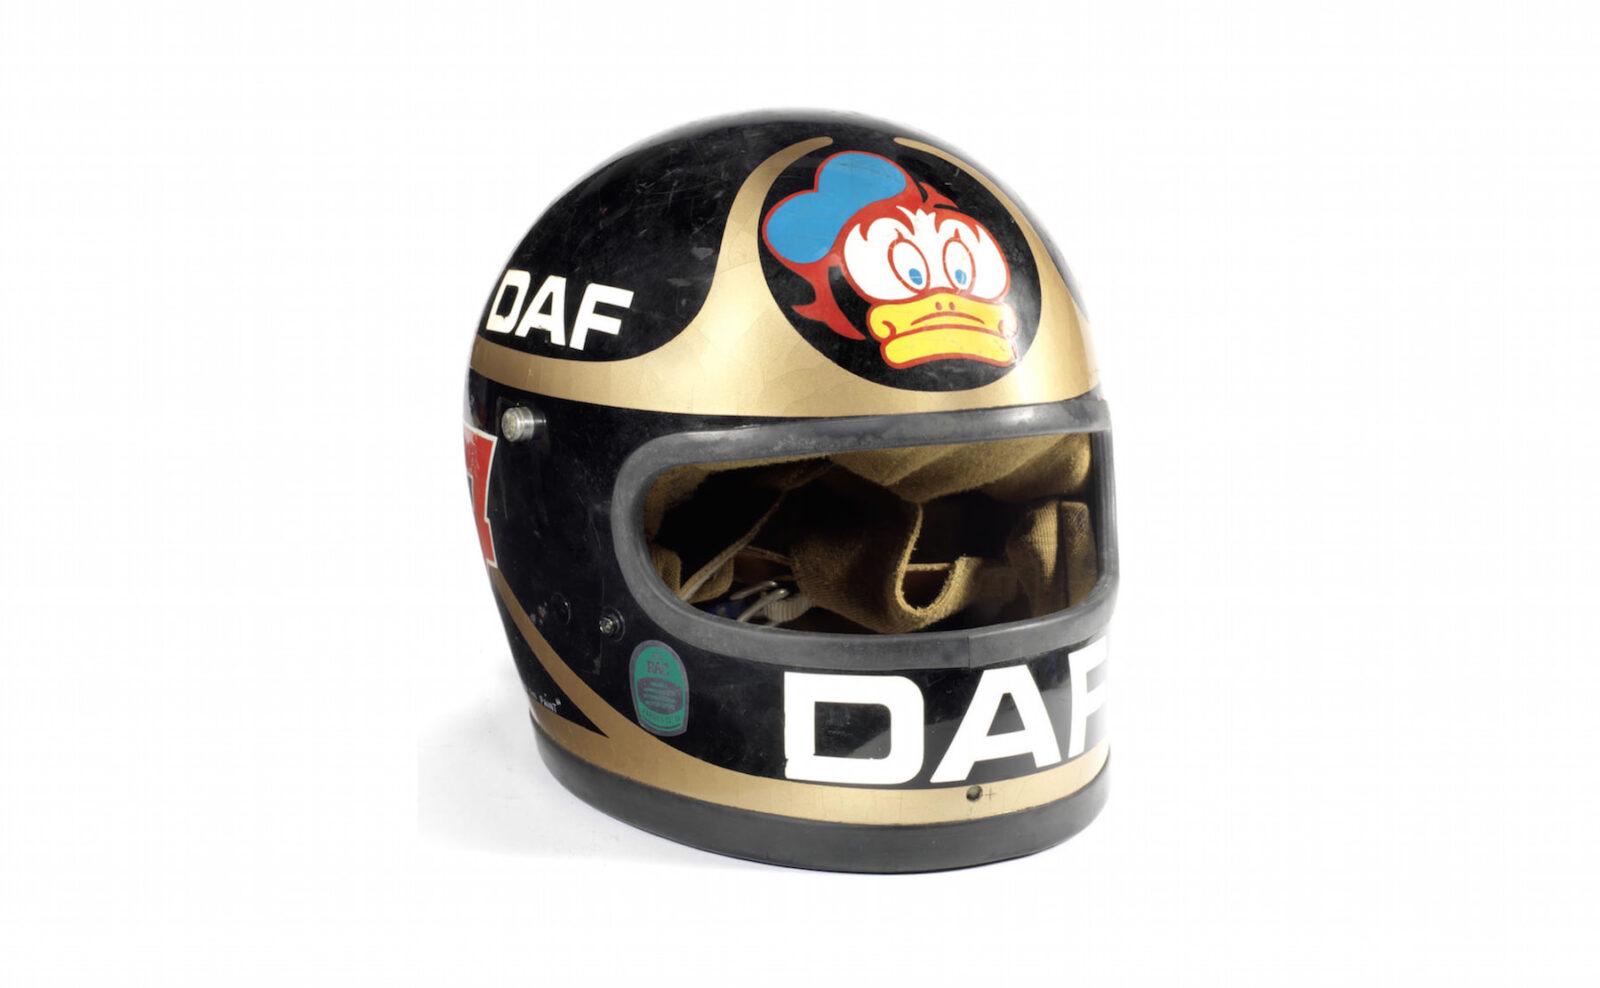 Vintage Bell Helmet 1600x988 - Barry Sheene's Bell Helmet